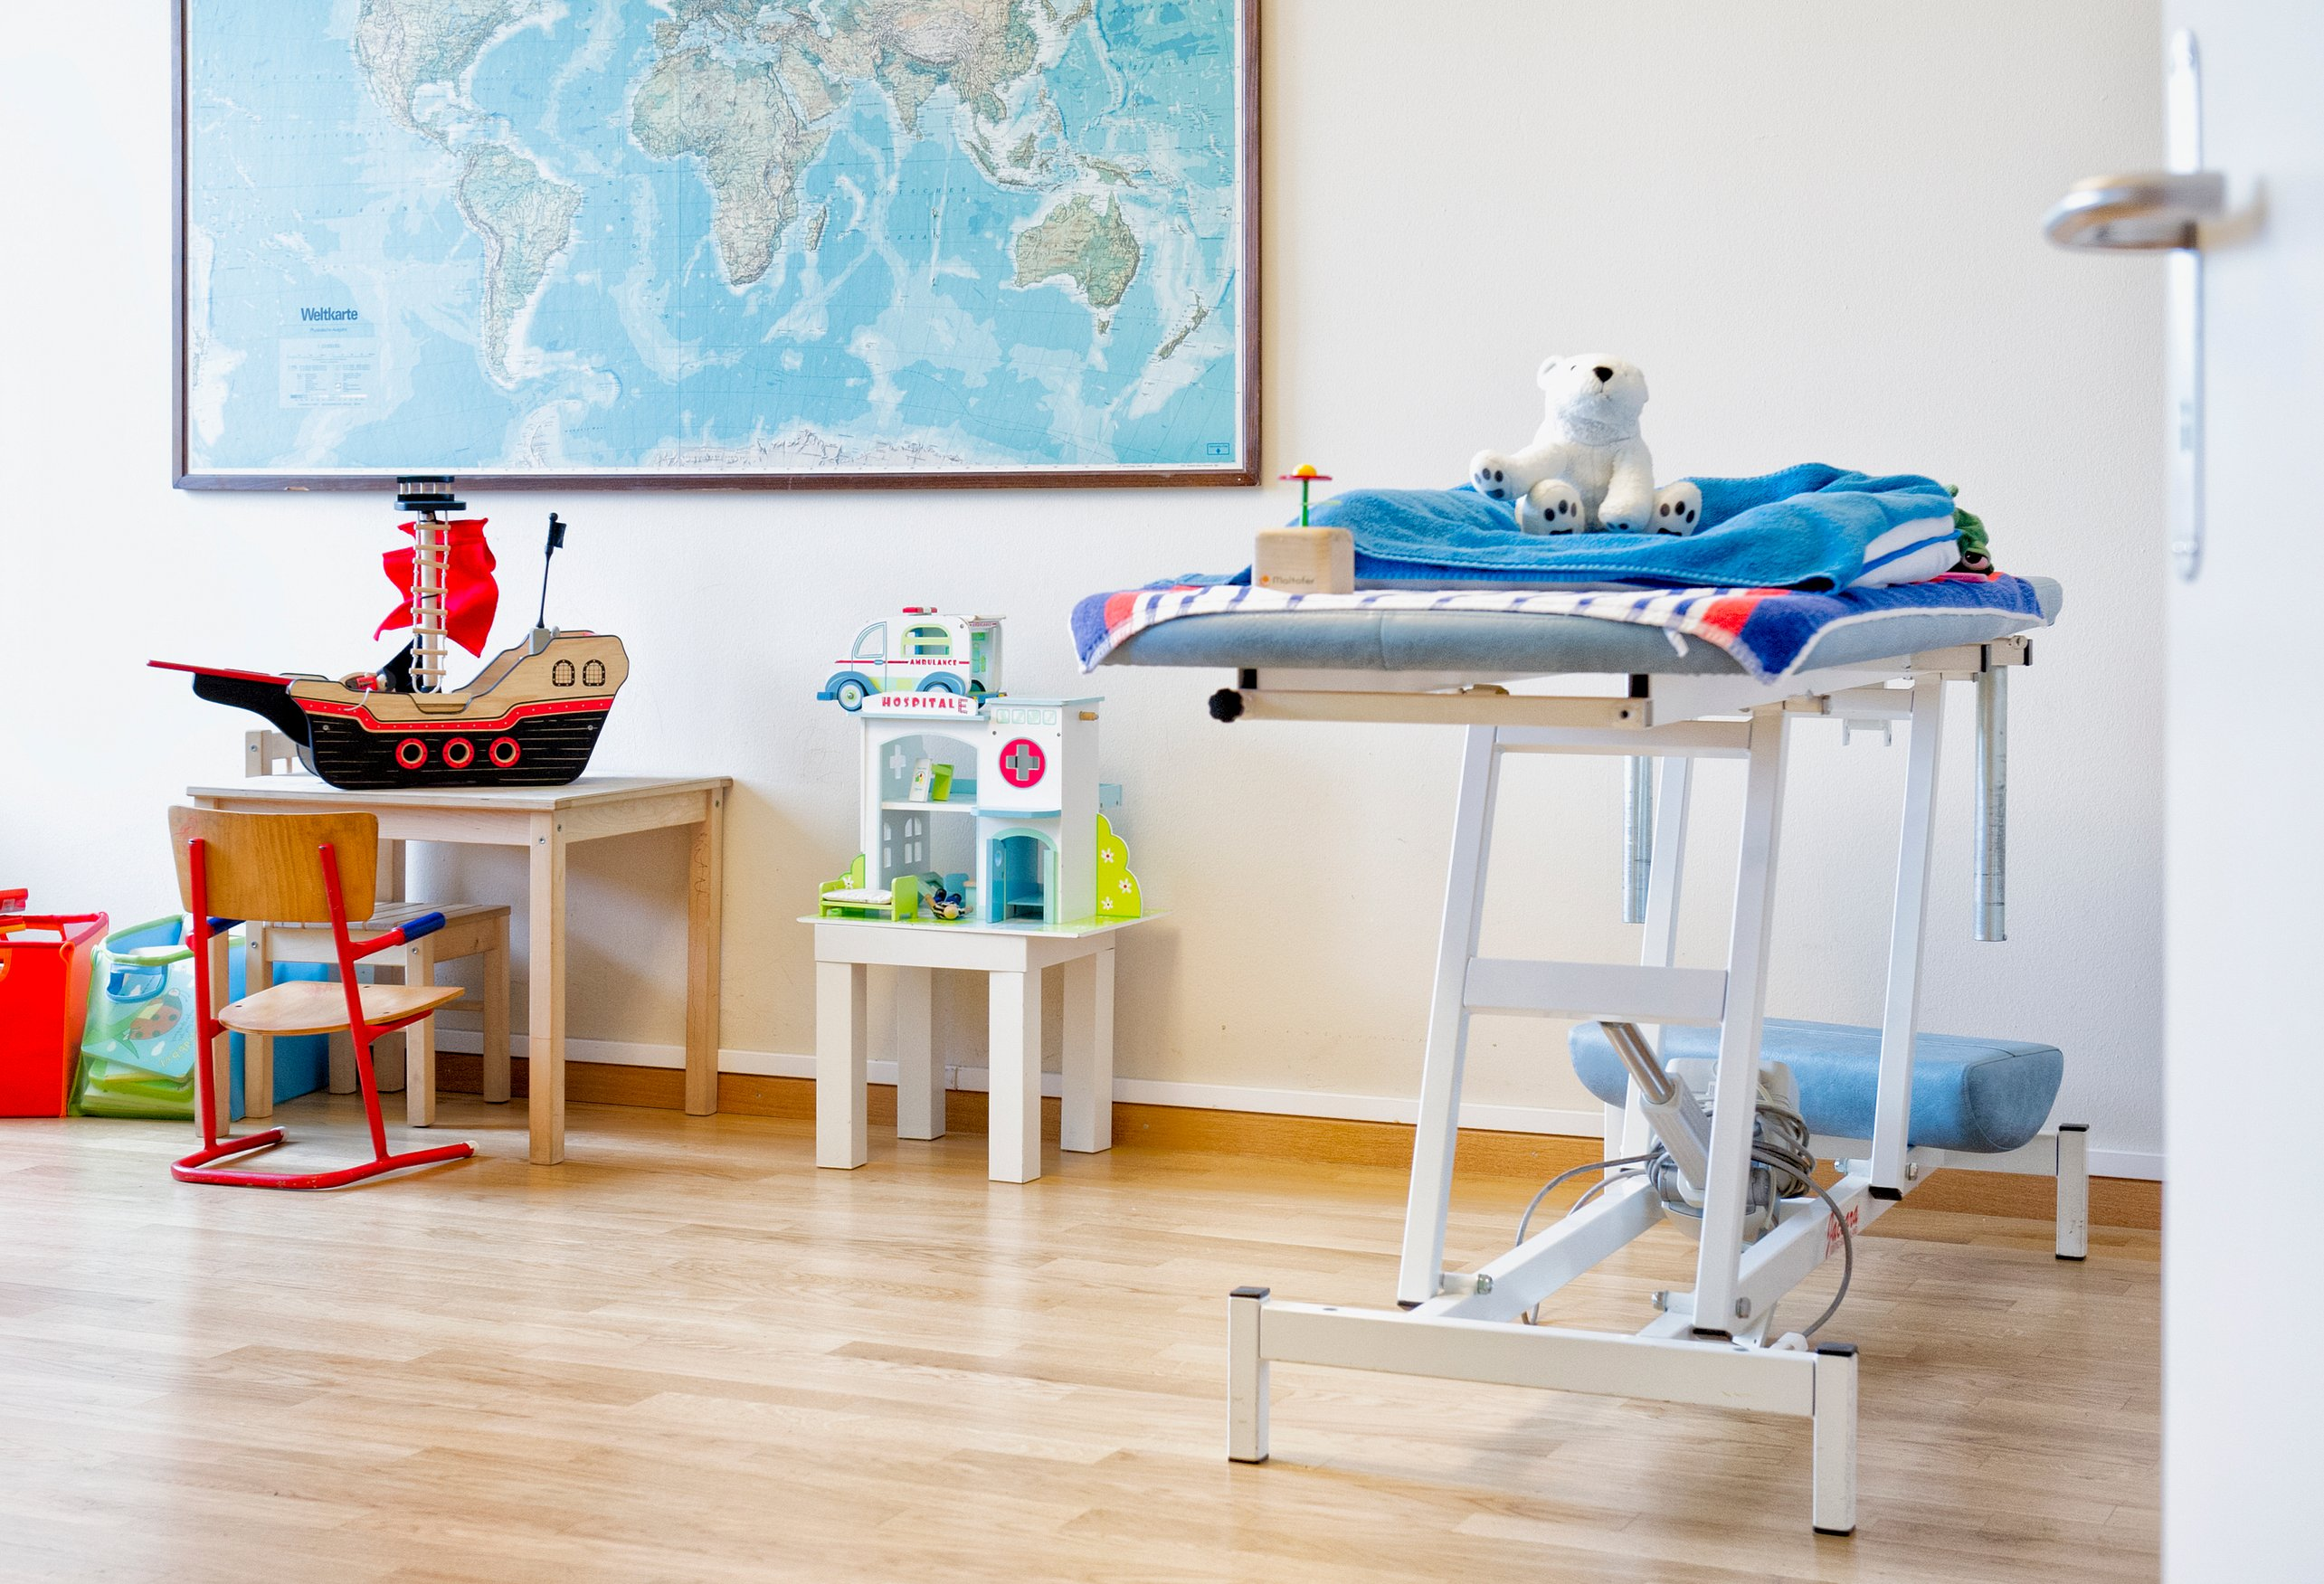 SIHLMED Zentrum für Integrative Medizin